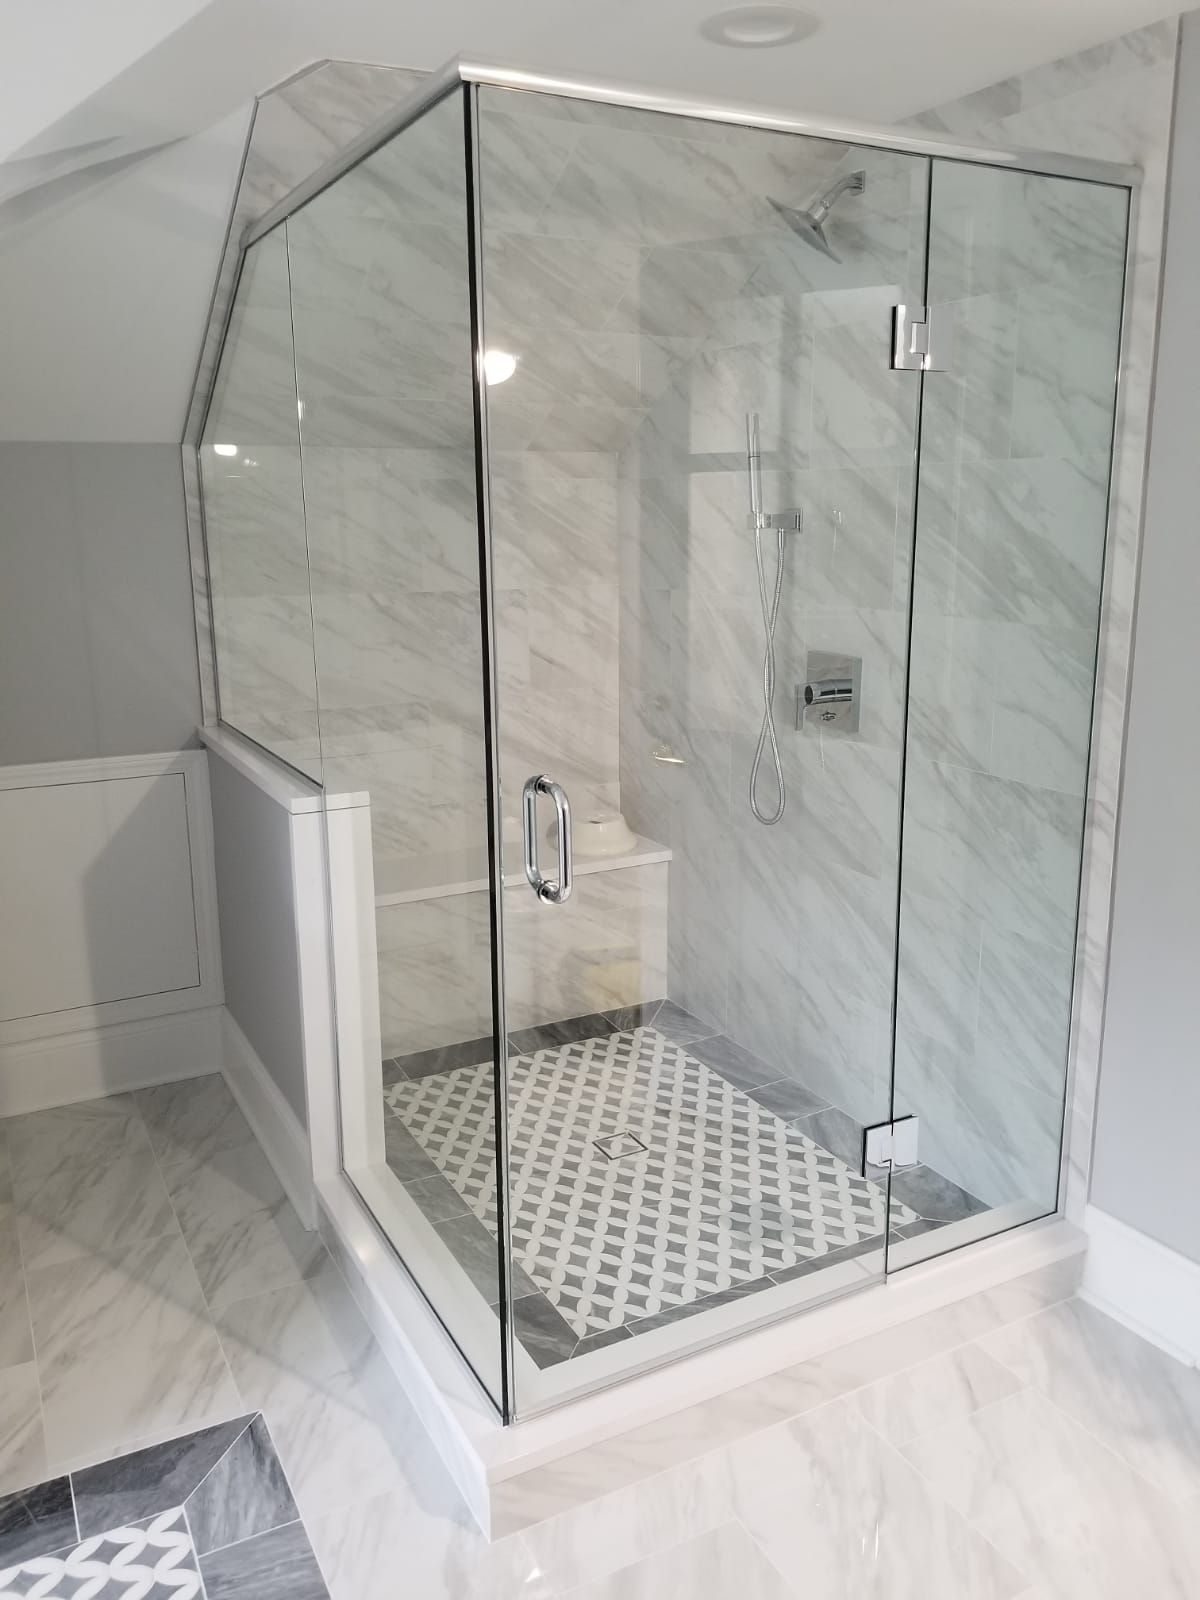 Frameless Clear Glass Shower Enclosure Bathroom Remodel Glass Glass Shower Enclosures Glass Shower Frameless Glass Shower Enclosure